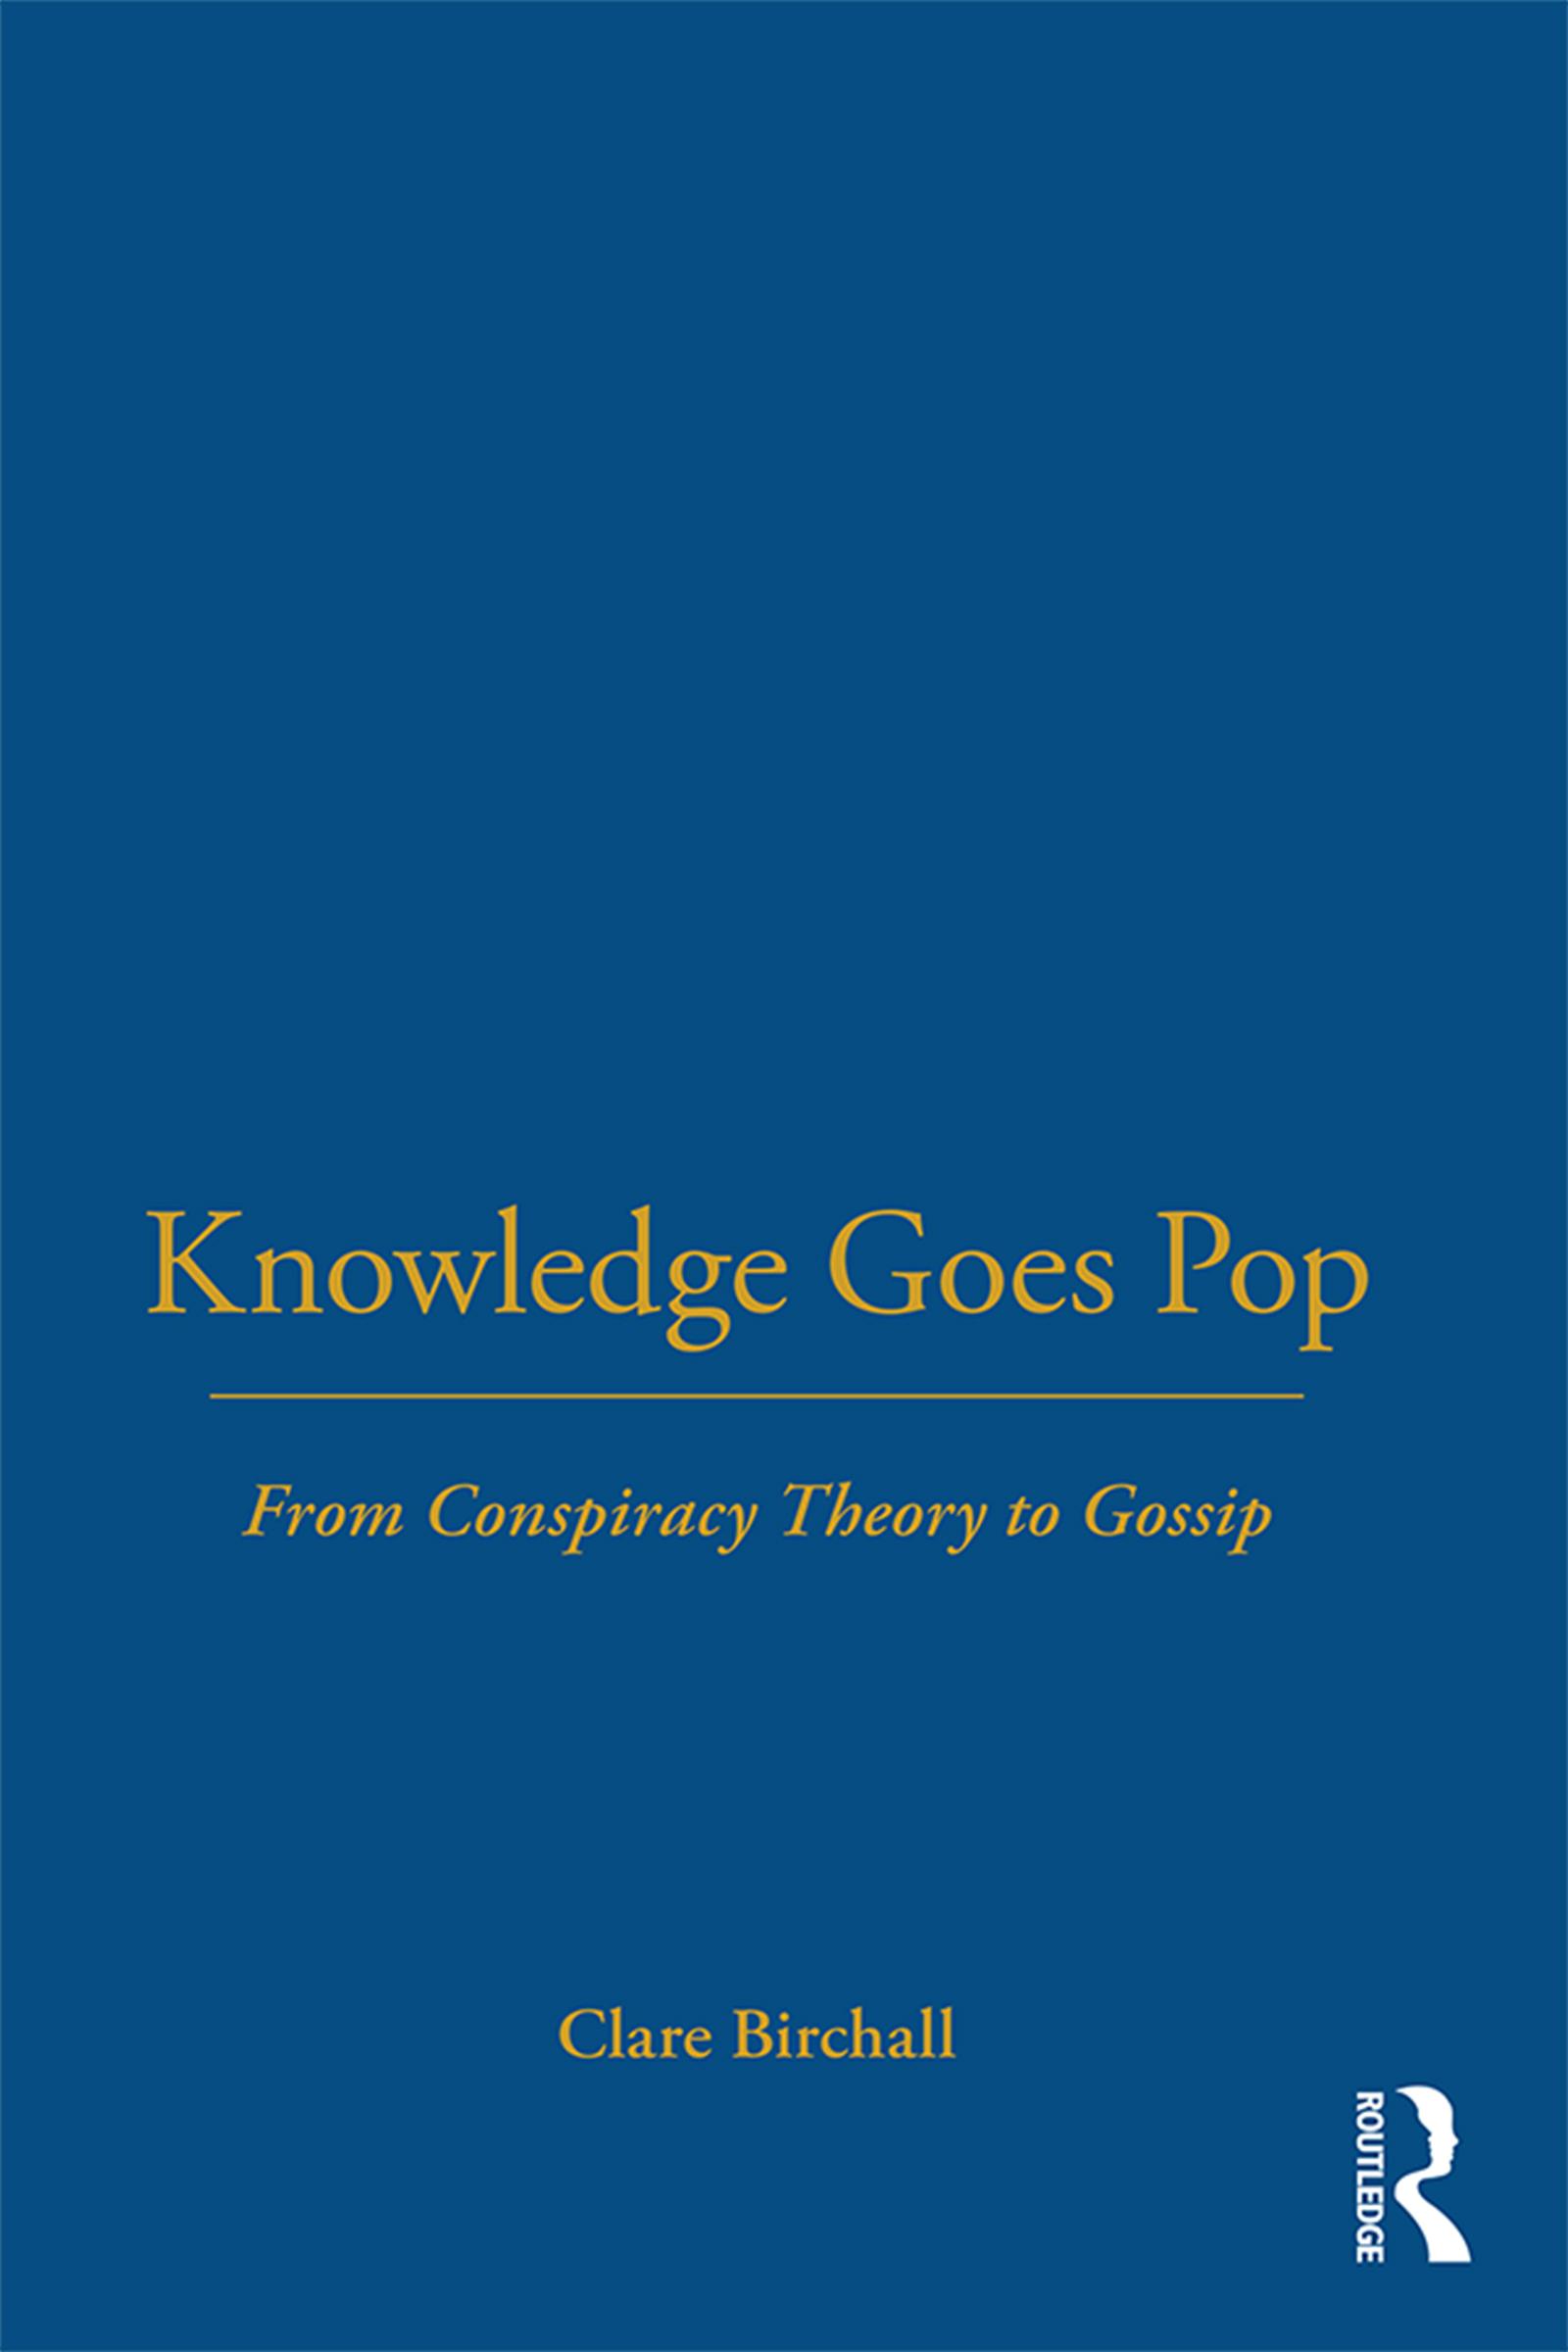 Knowledge Goes Pop